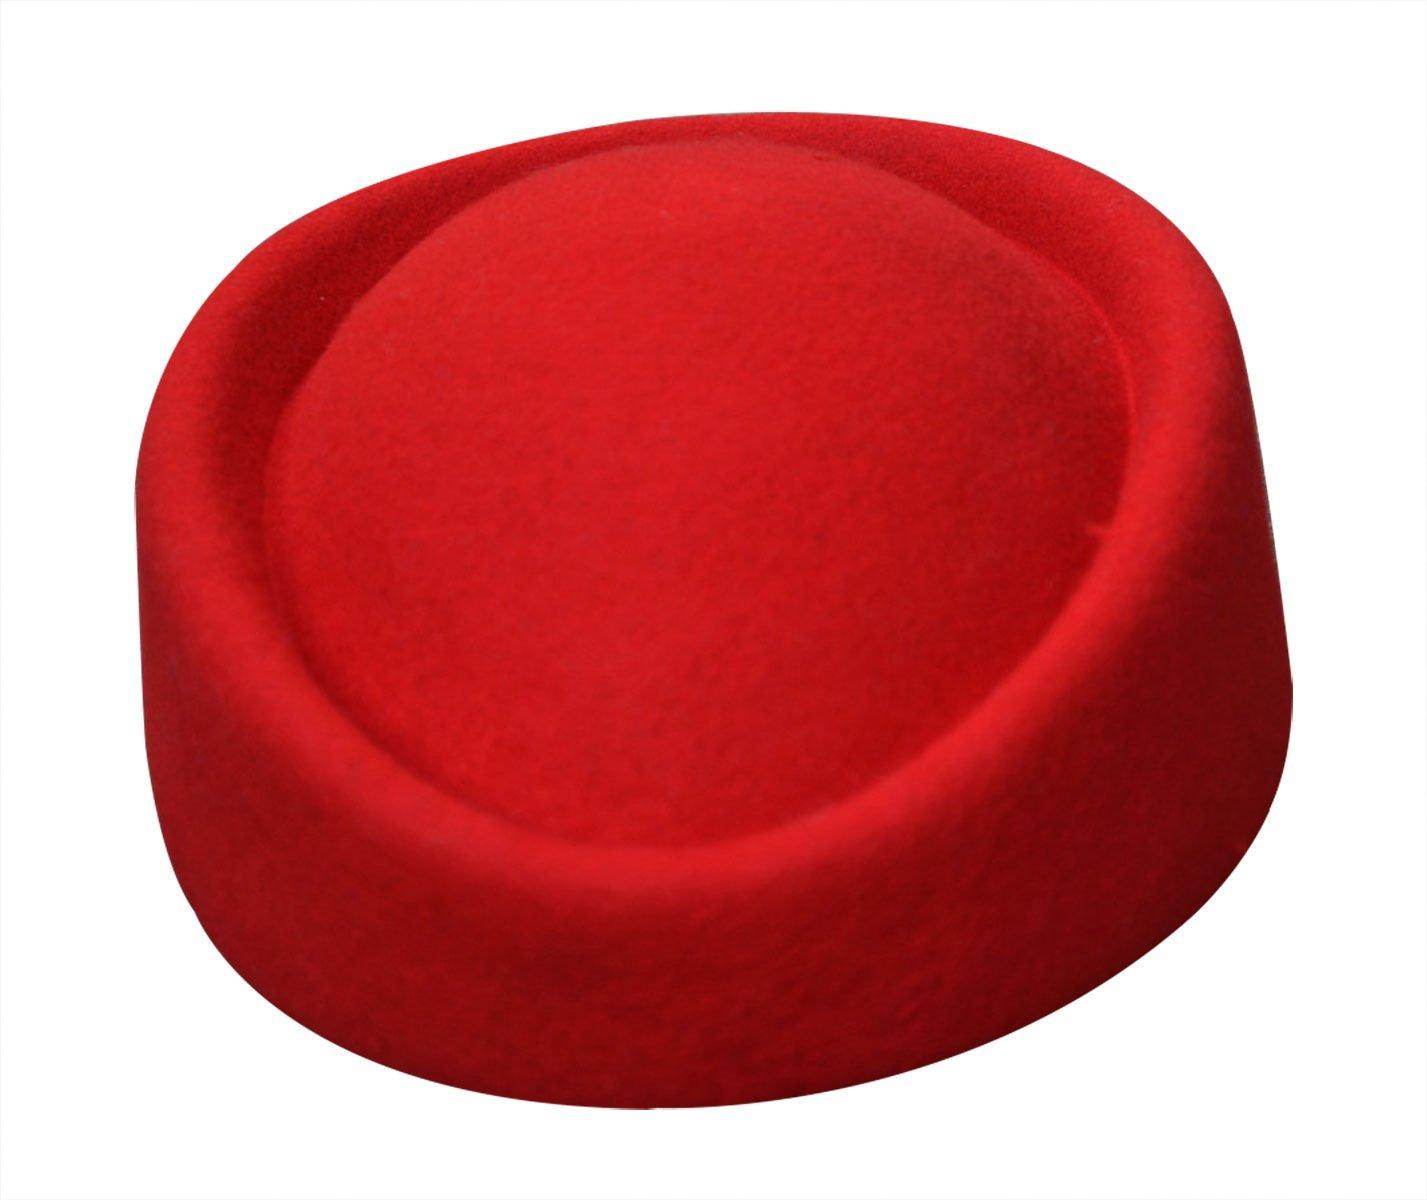 Lawliet Wool Felt Fascinator Wedding Hat Pillbox Hat for Women Pretty Hostesses Cap A139Black